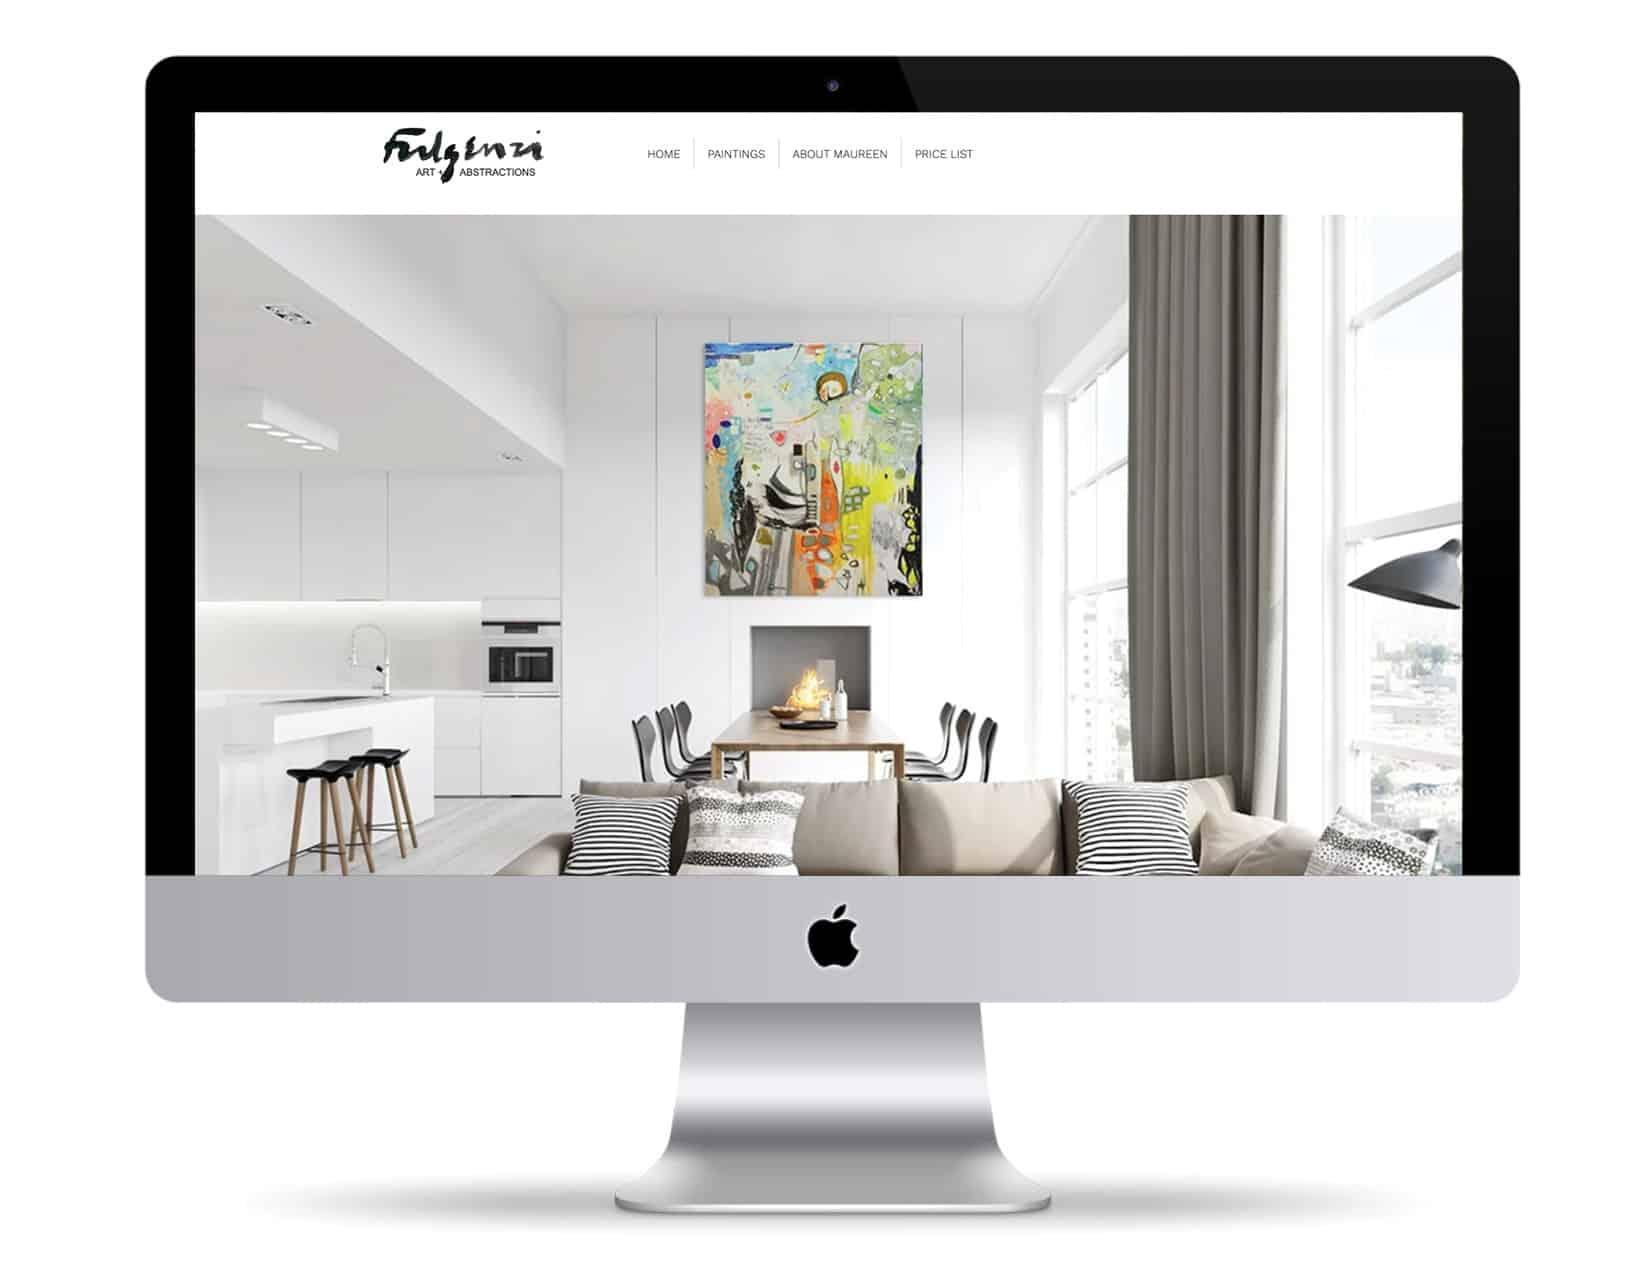 Molly Greene web design